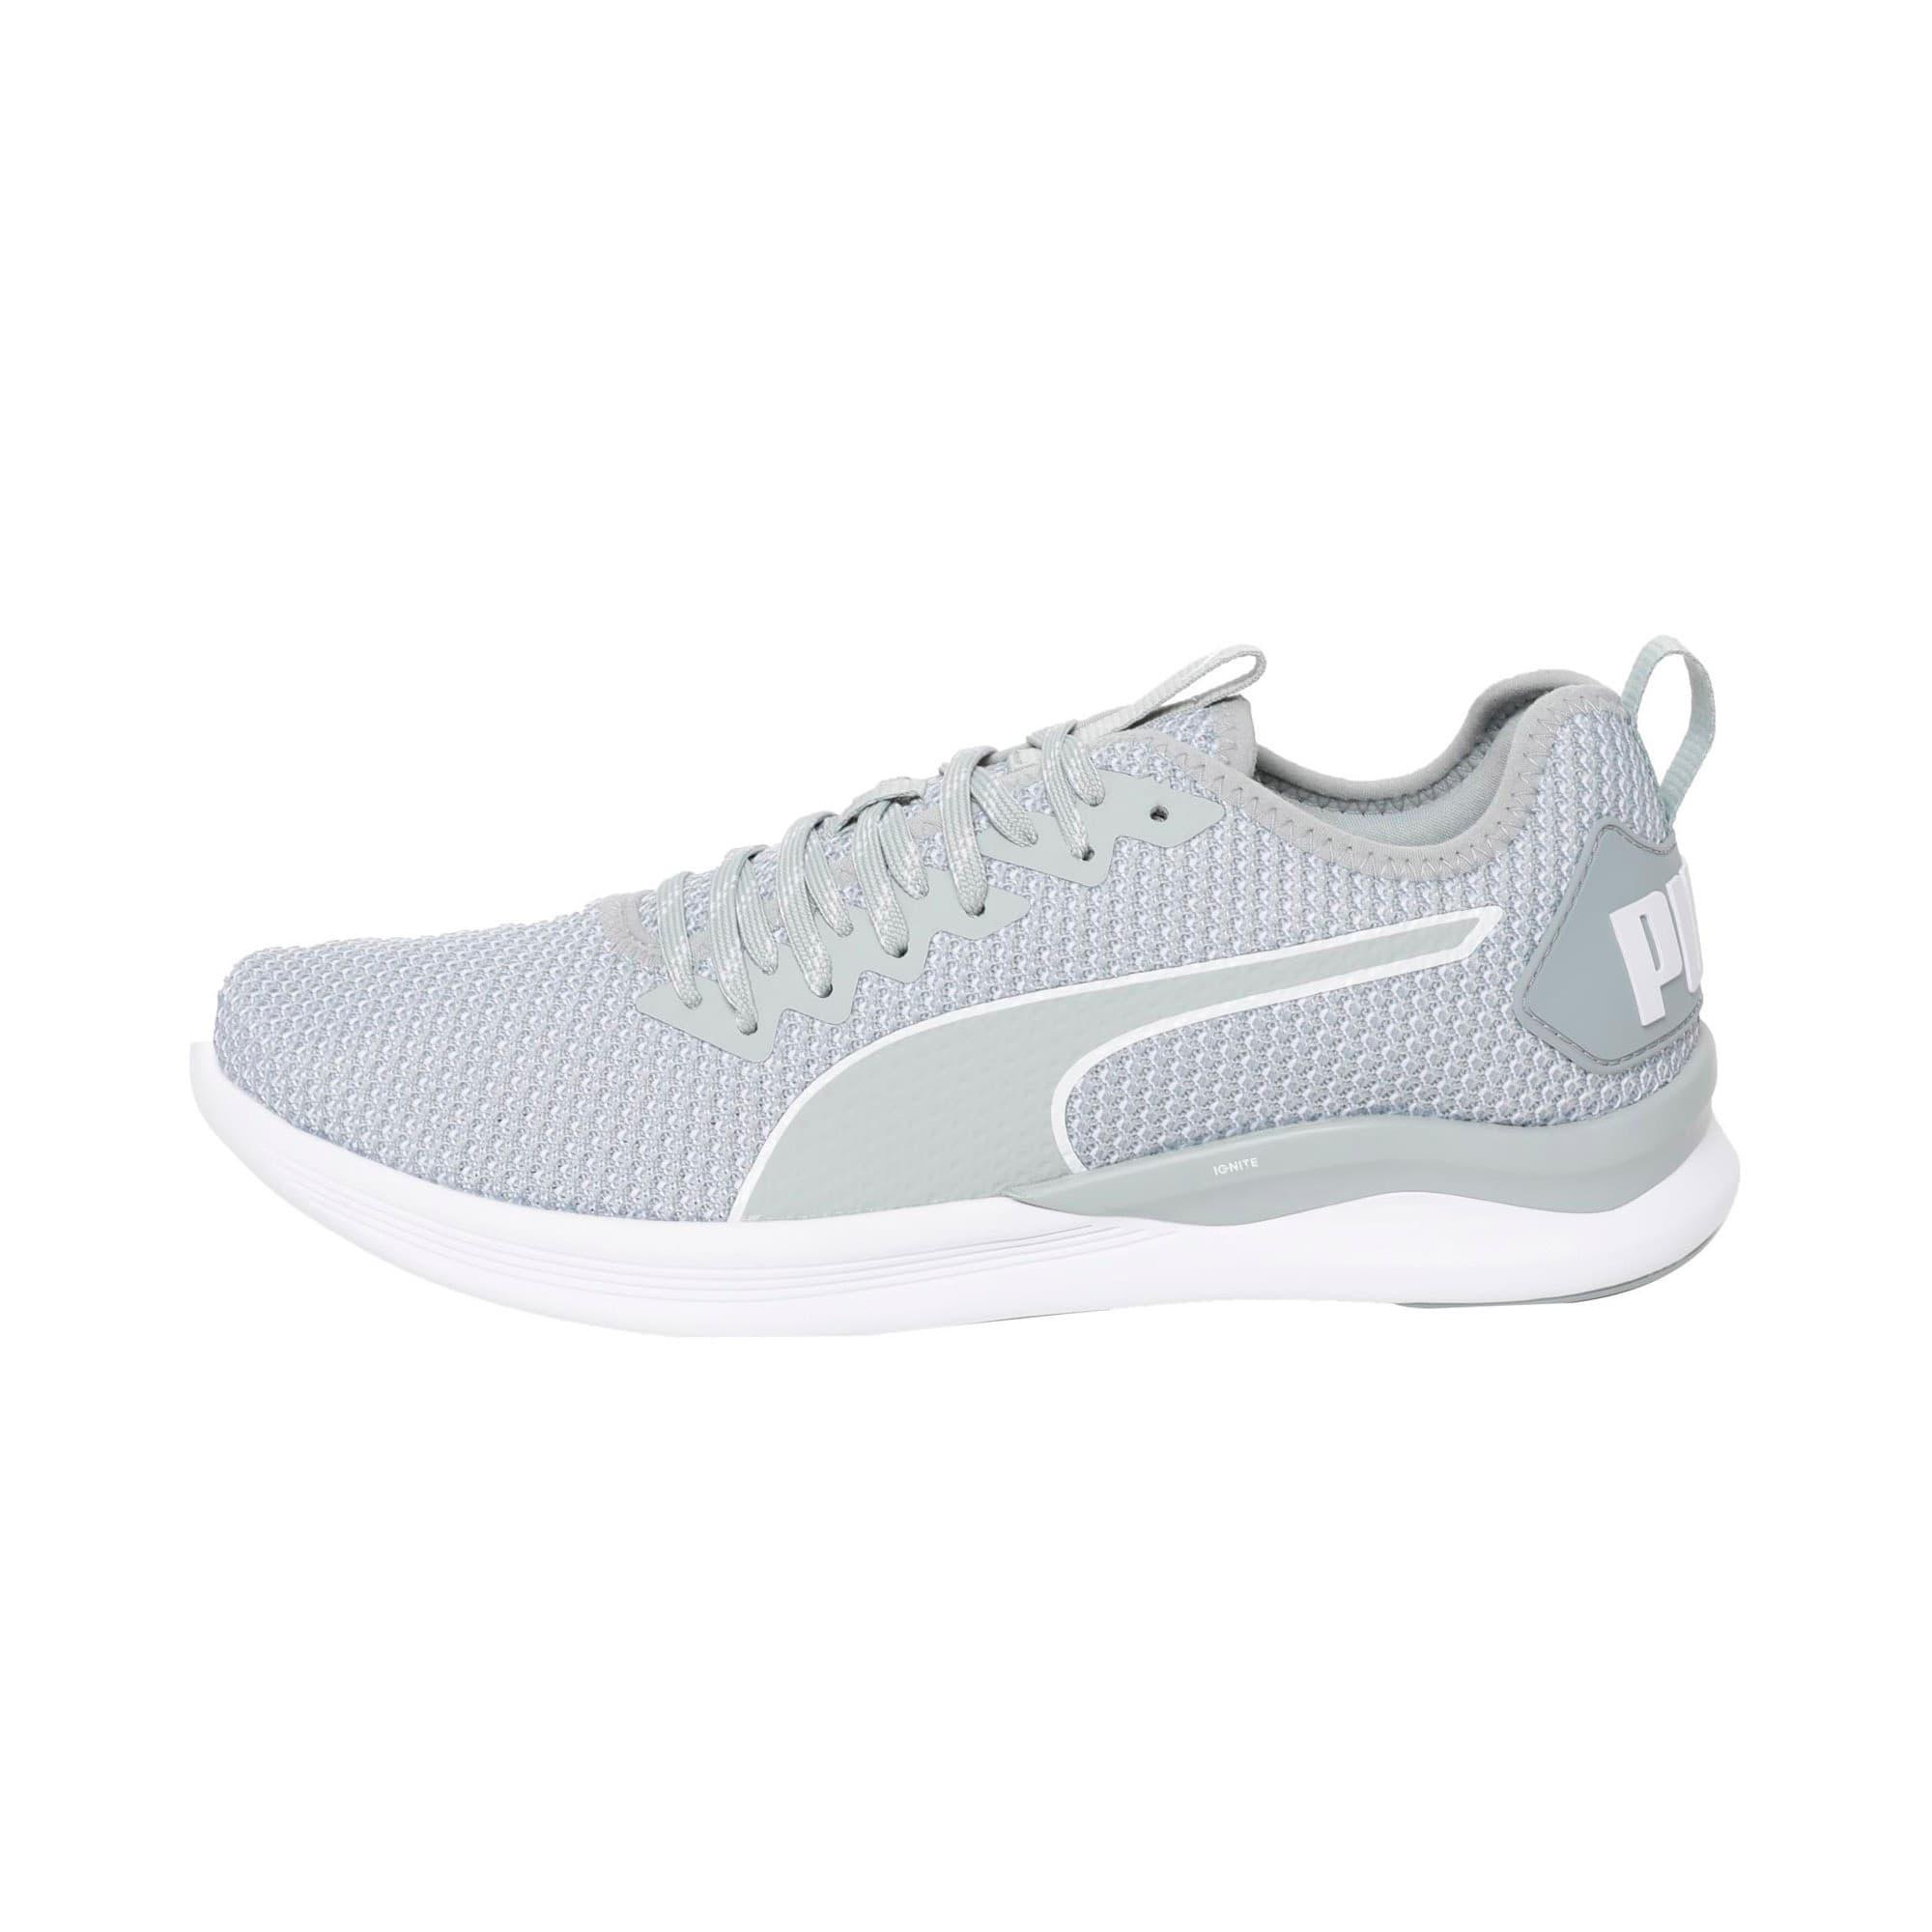 Thumbnail 1 of IGNITE Flash FS Men's Running Shoes, Quarry-Puma White, medium-IND